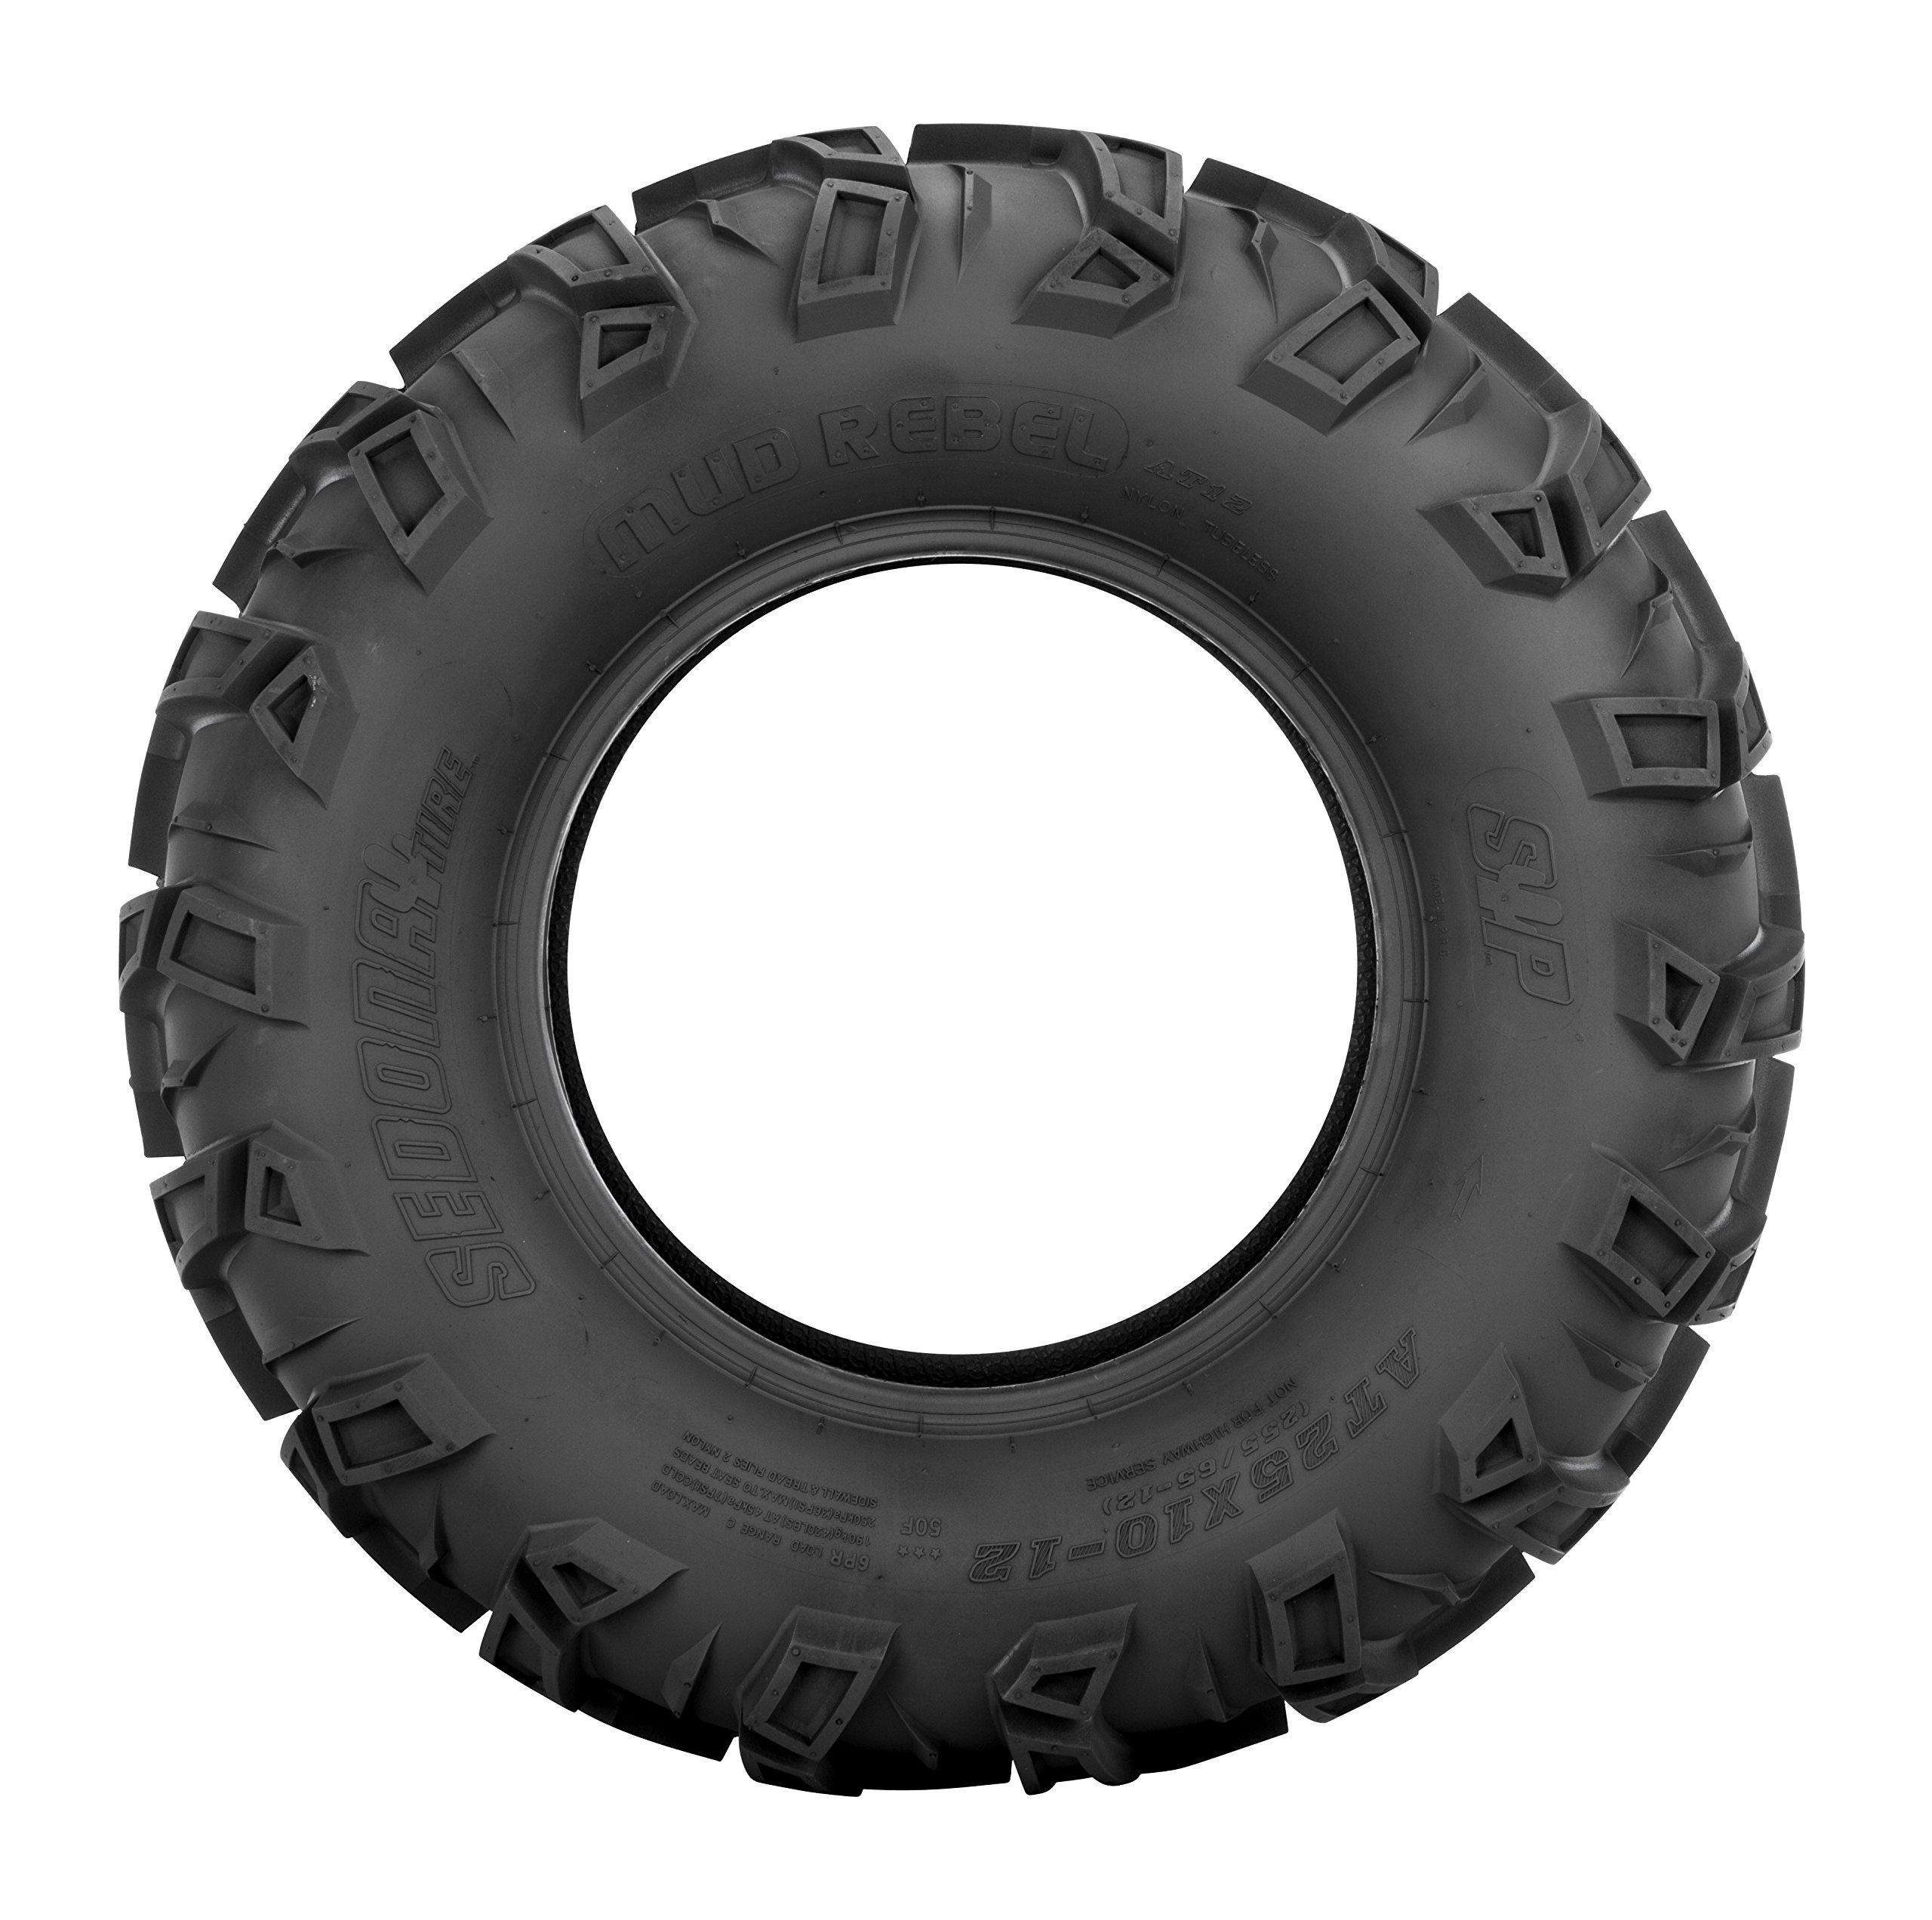 Sedona Mud Rebel Front Tire - 22x8-10, Position: Front, Rim Size: 10, Tire Application: All-Terrain, Tire Size: 22x8x10, Tire Type: ATV/UTV, Tire Ply: 6 MR22810